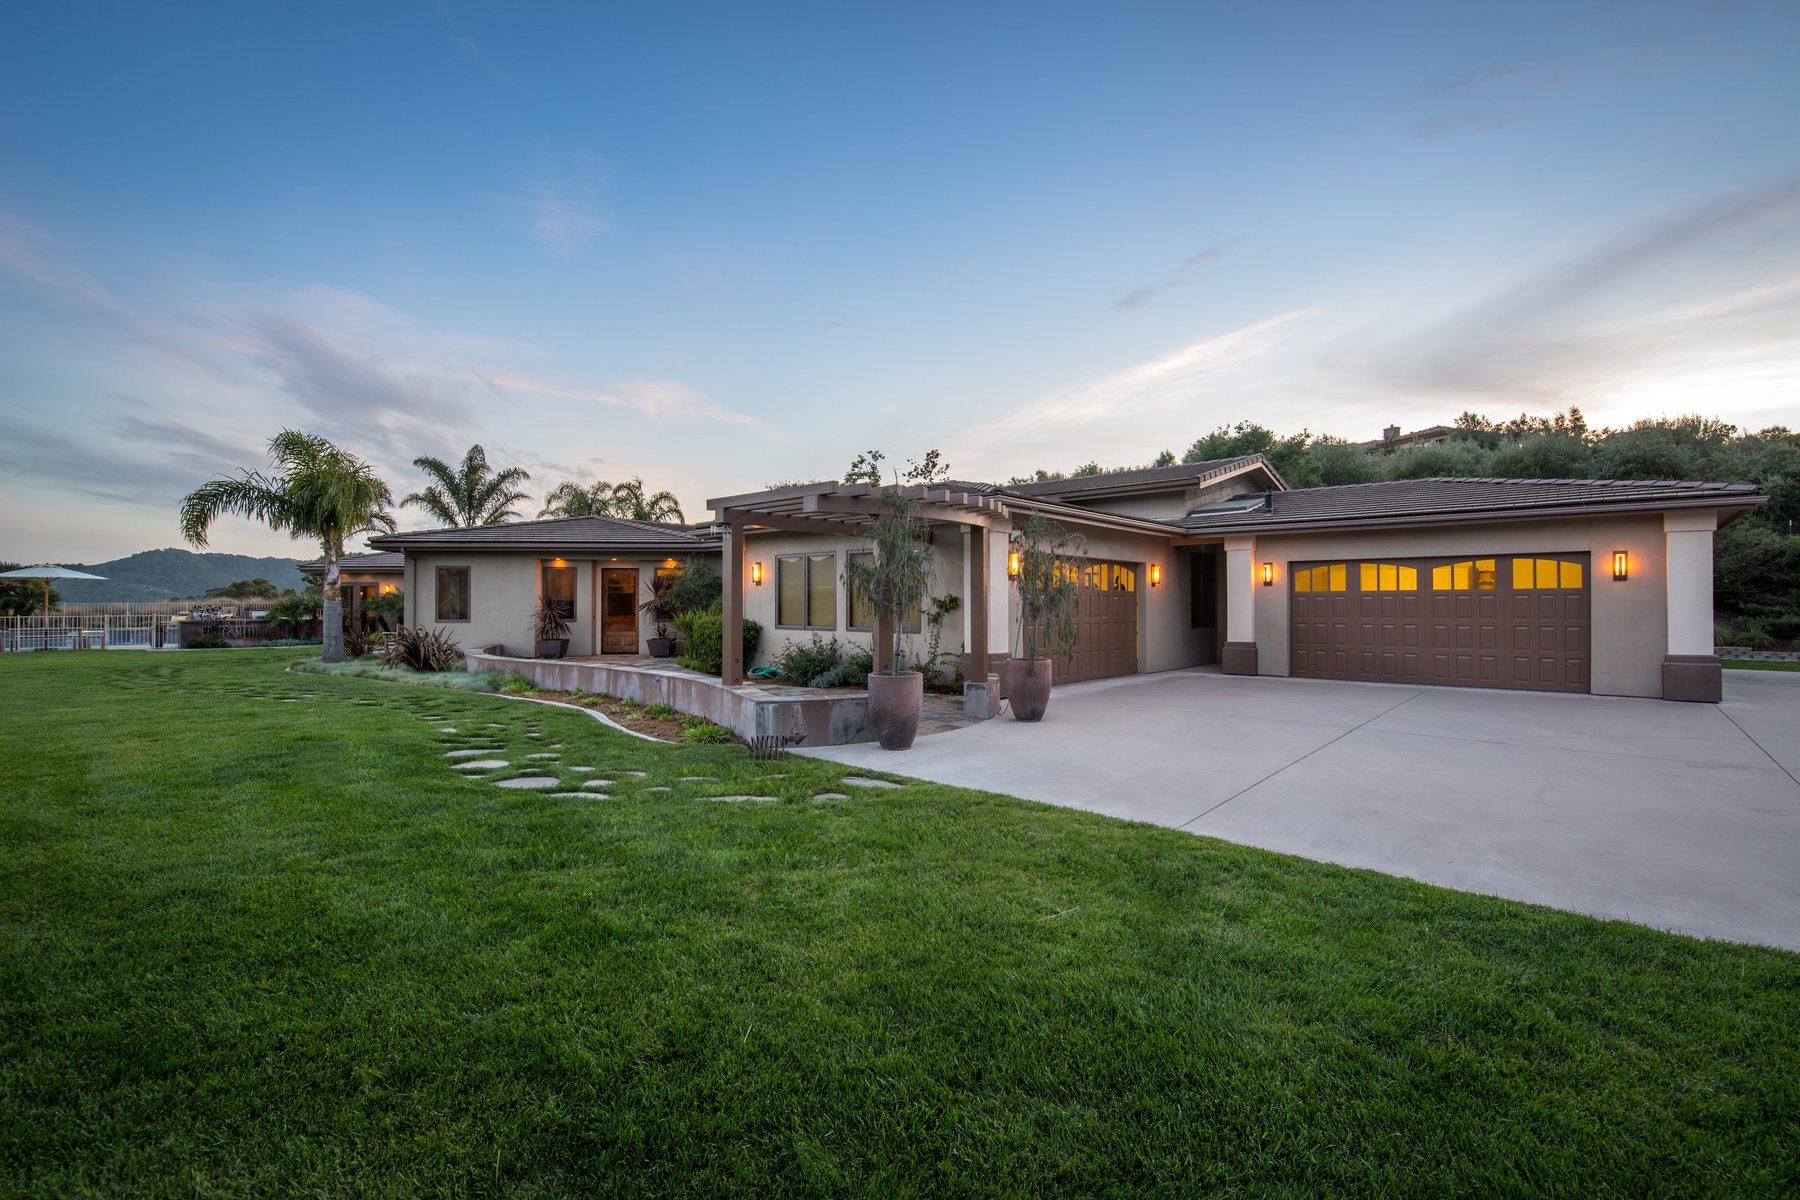 獨棟家庭住宅 為 出售 在 Bassi Ranch Estate, 2 Guest Houses & Pool House 425 Bassi Drive, San Luis Obispo, 加利福尼亞州, 93405 美國